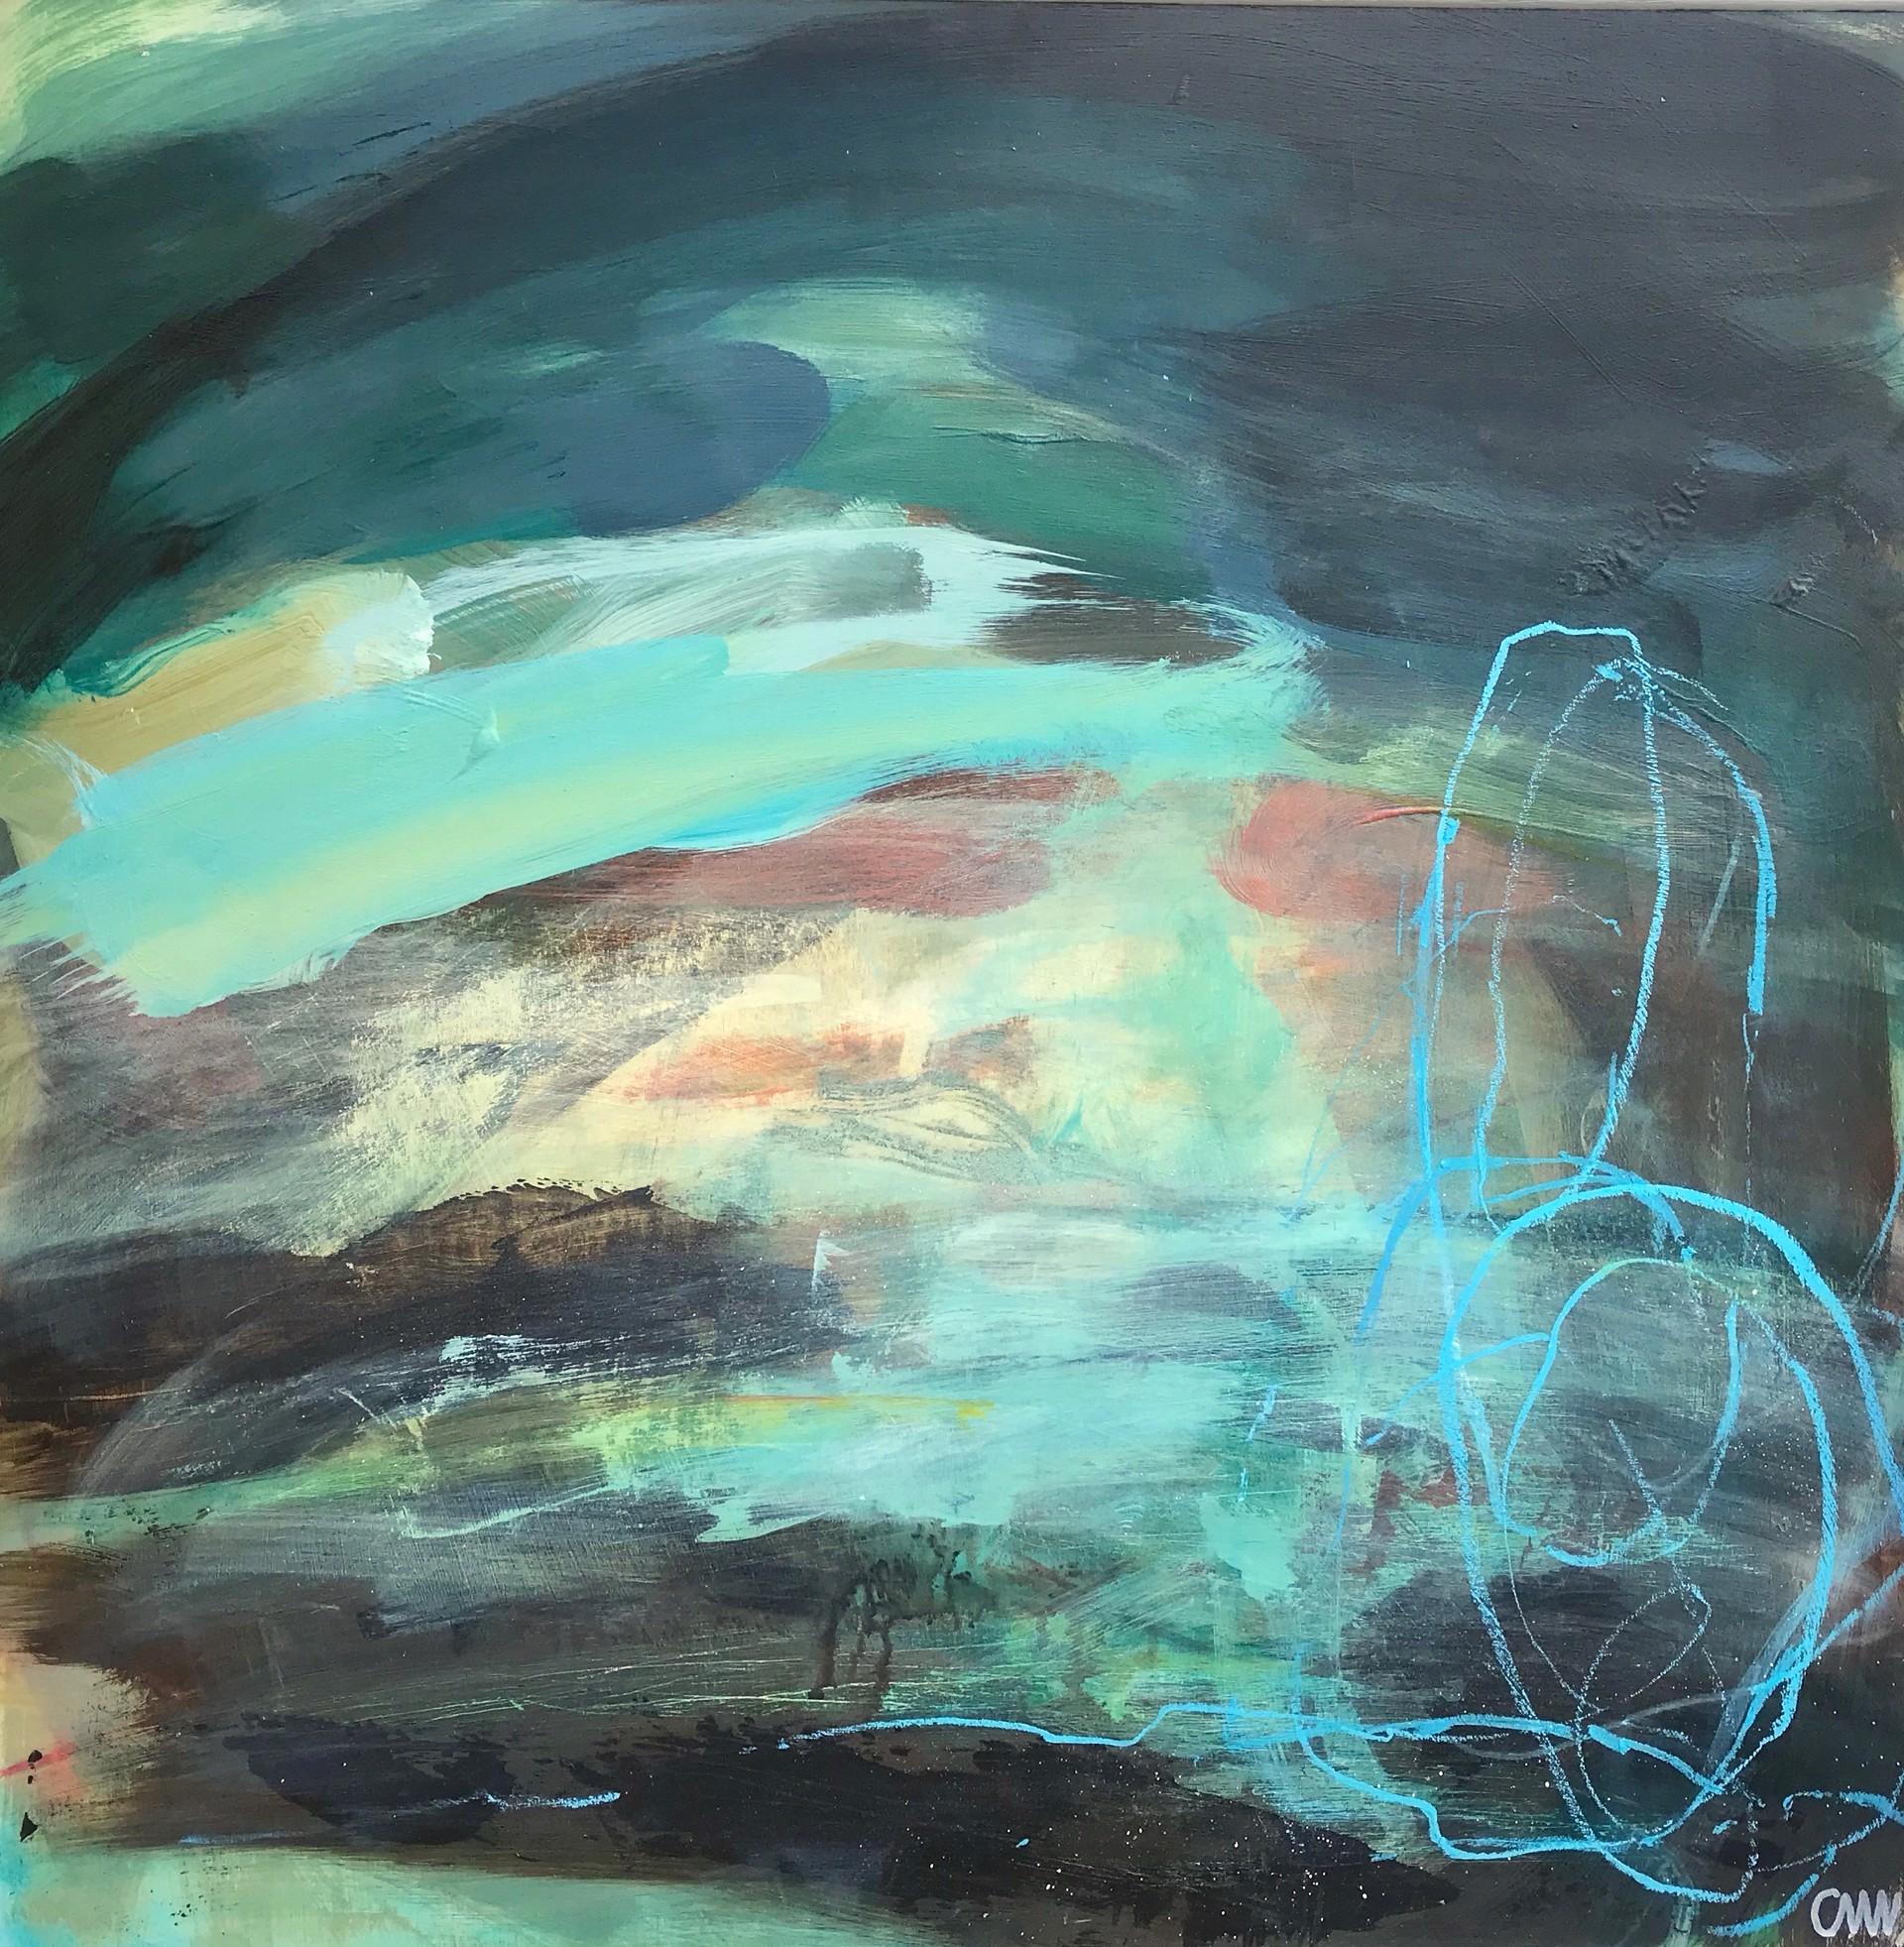 Winter Seas III by Clare Maria Wood